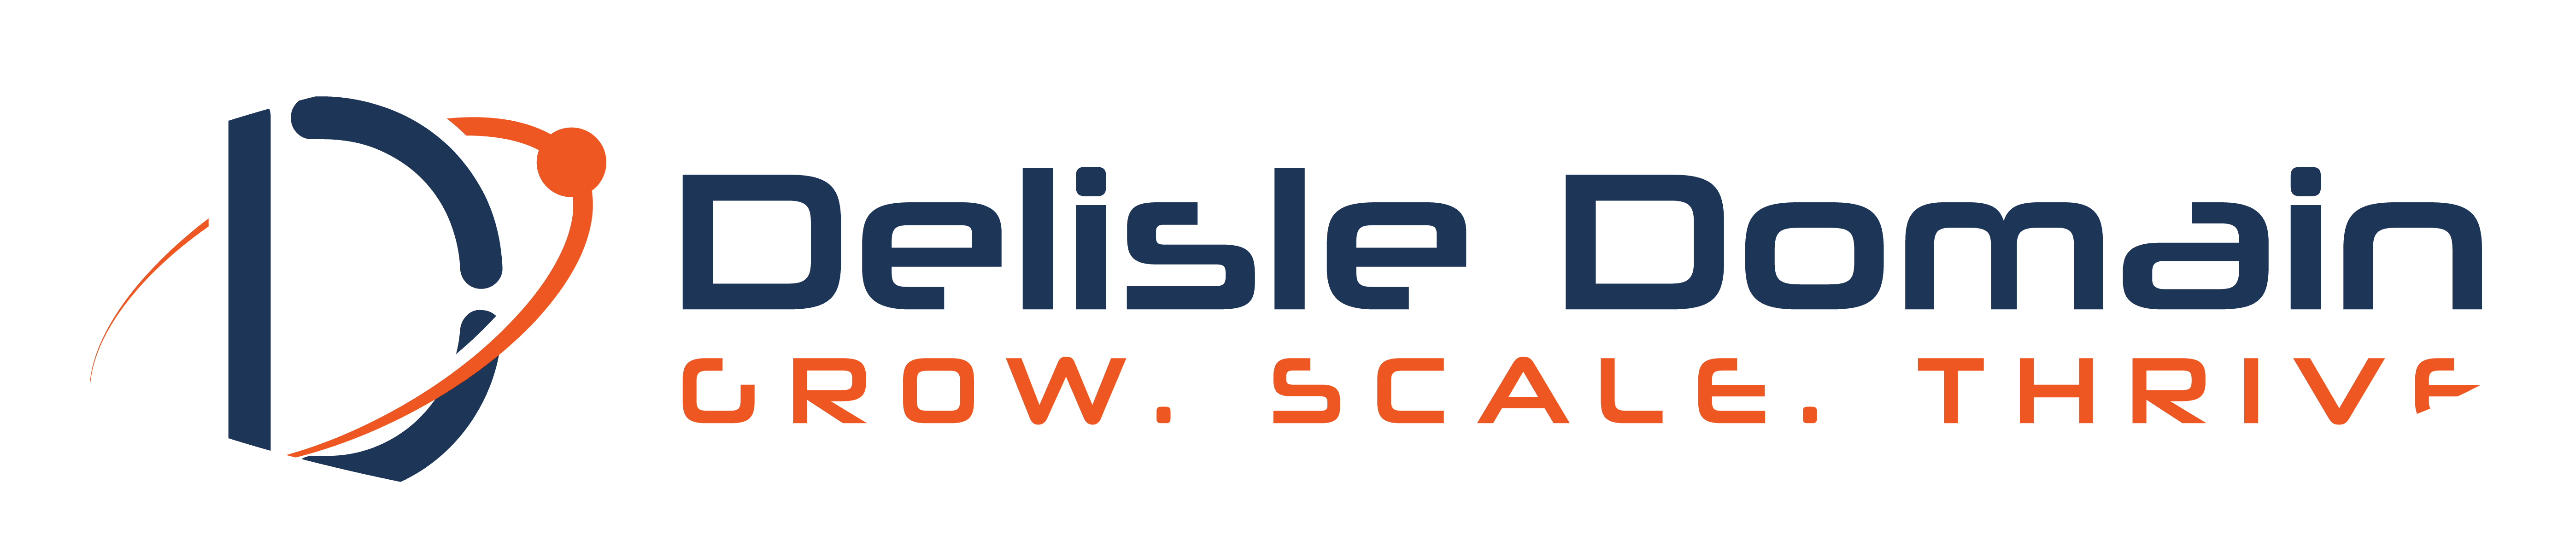 Delisle Domain Logo